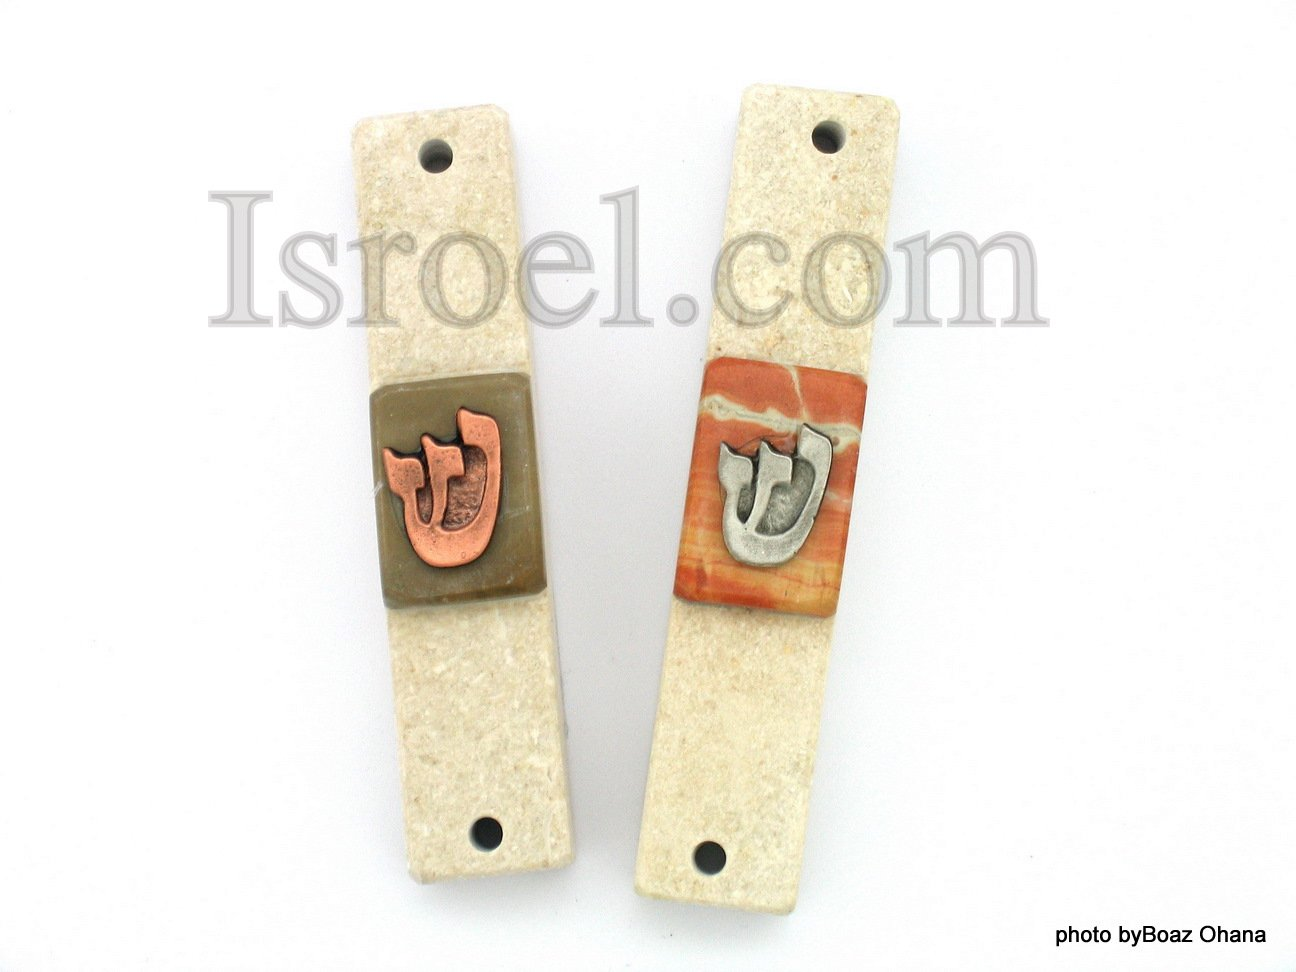 70585 MARBLE MEZUZAH L.GRAY COLOR, METAL COLORS SHIN 7CM, ISRAEL JEWISH JUDAICA MEZUZA BY ISROEL.COM